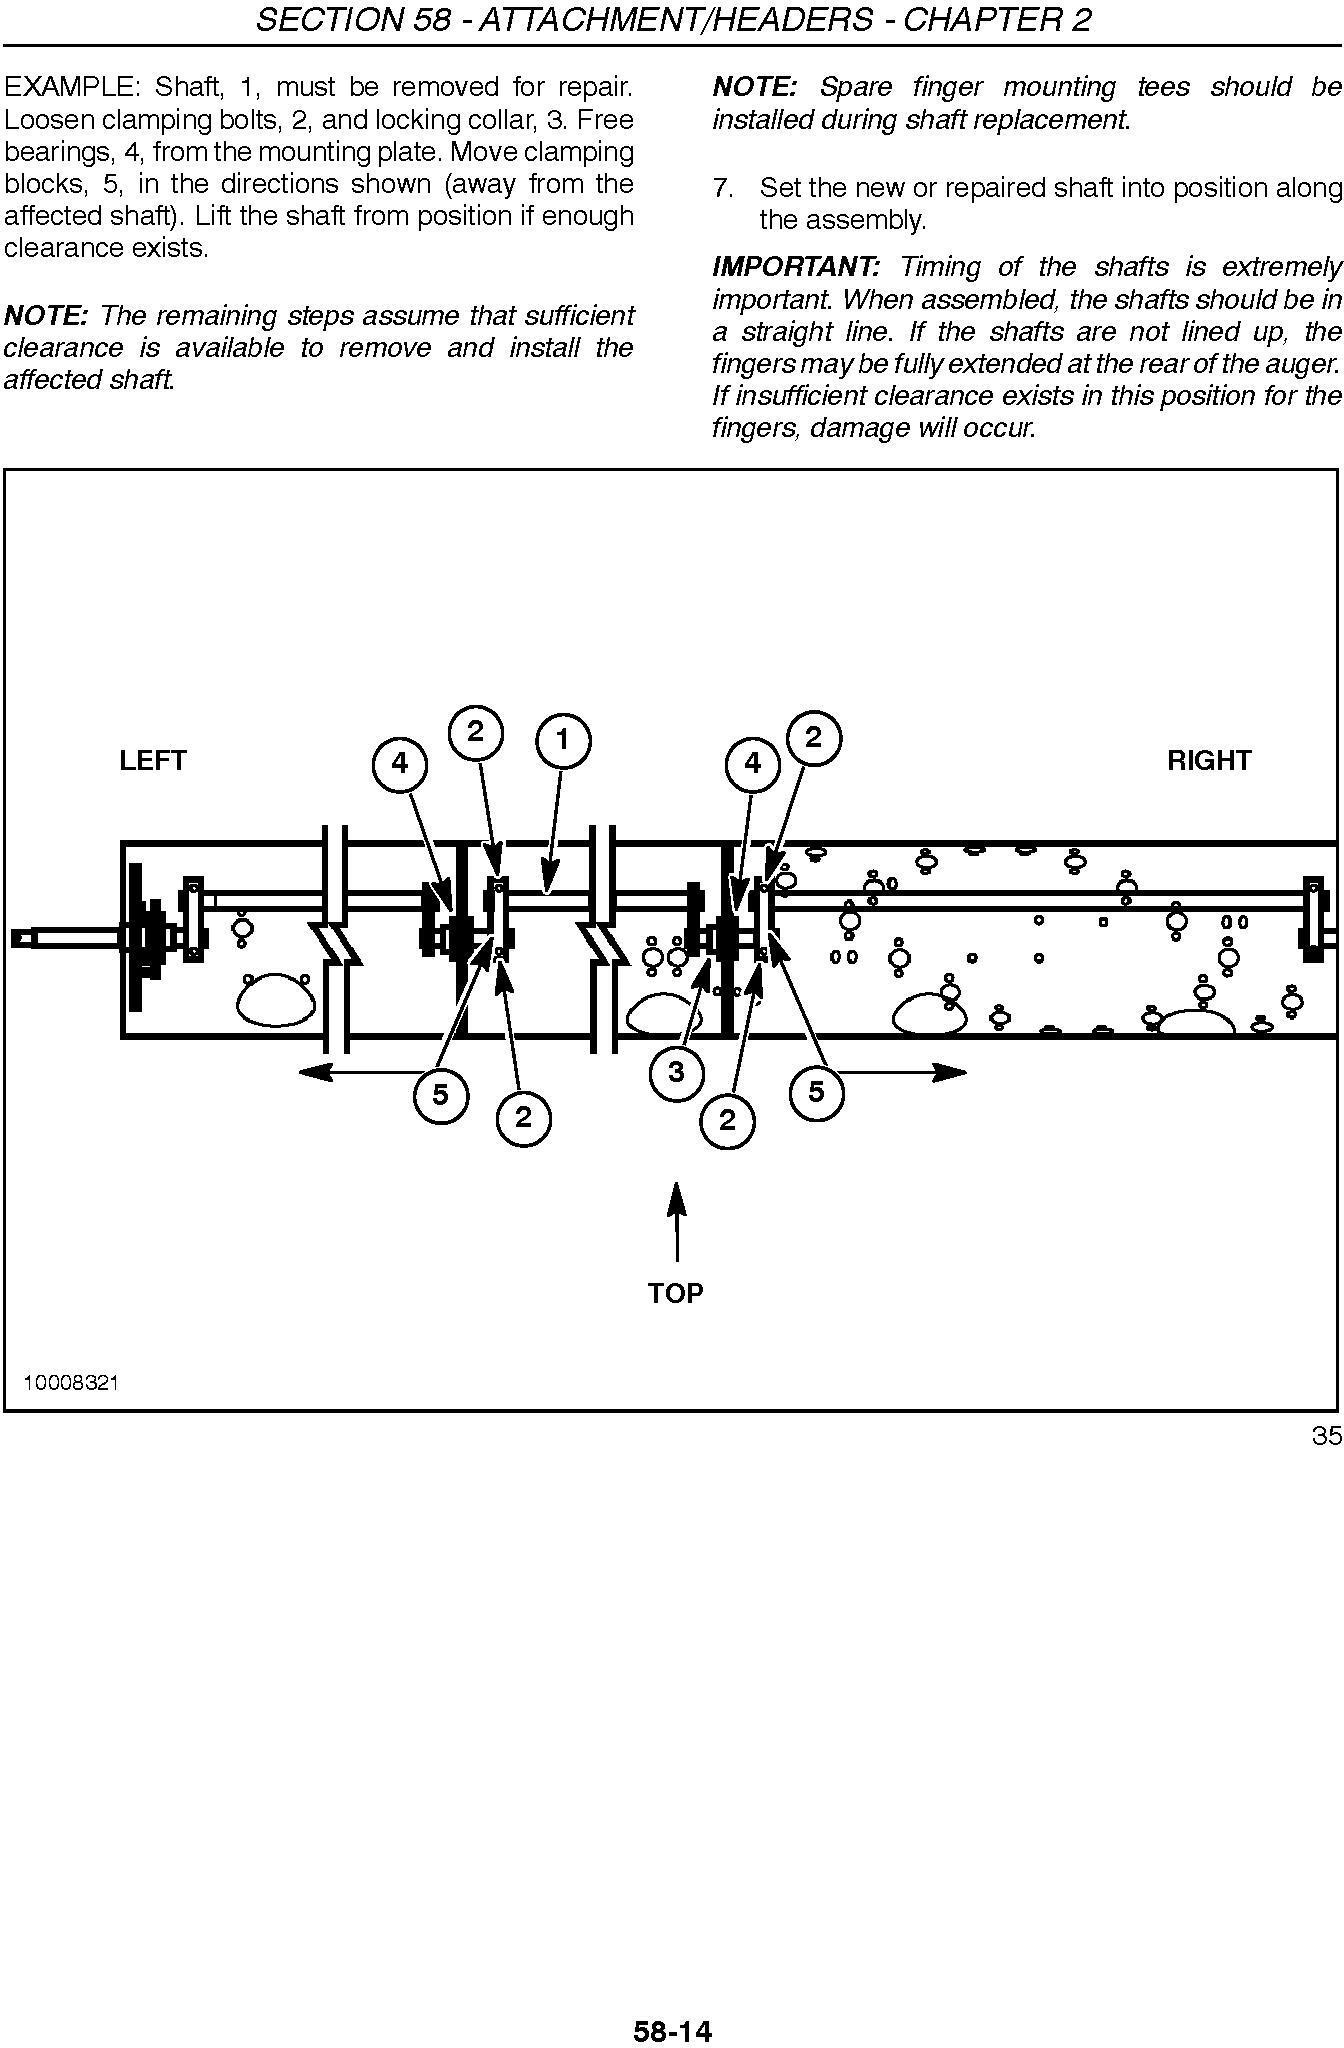 New Holland 72c, 74c Grain Head Service Manual - 3